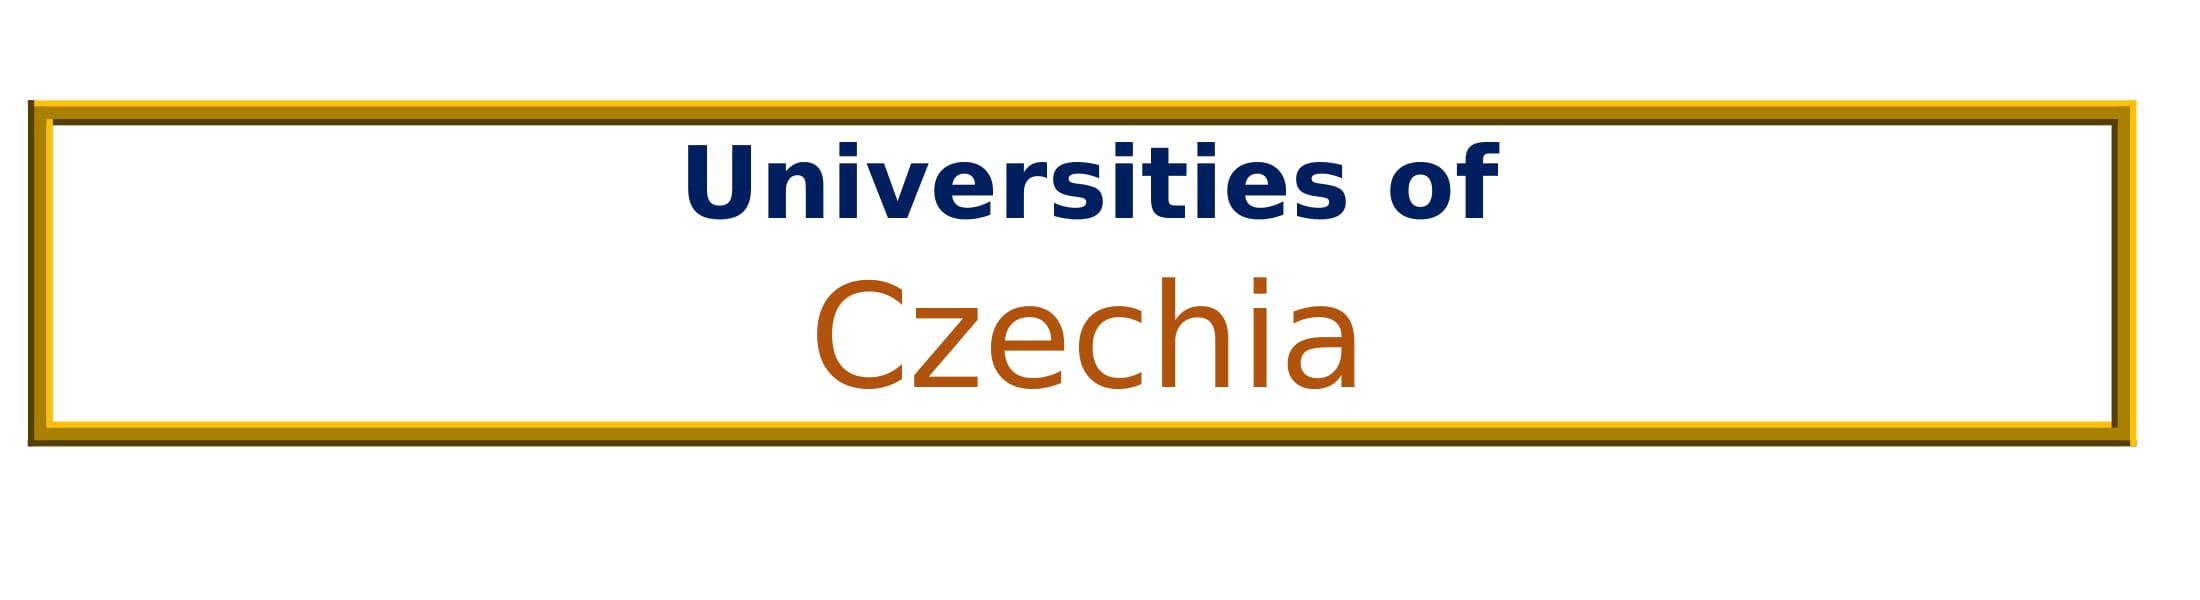 List of Universities in Czechia